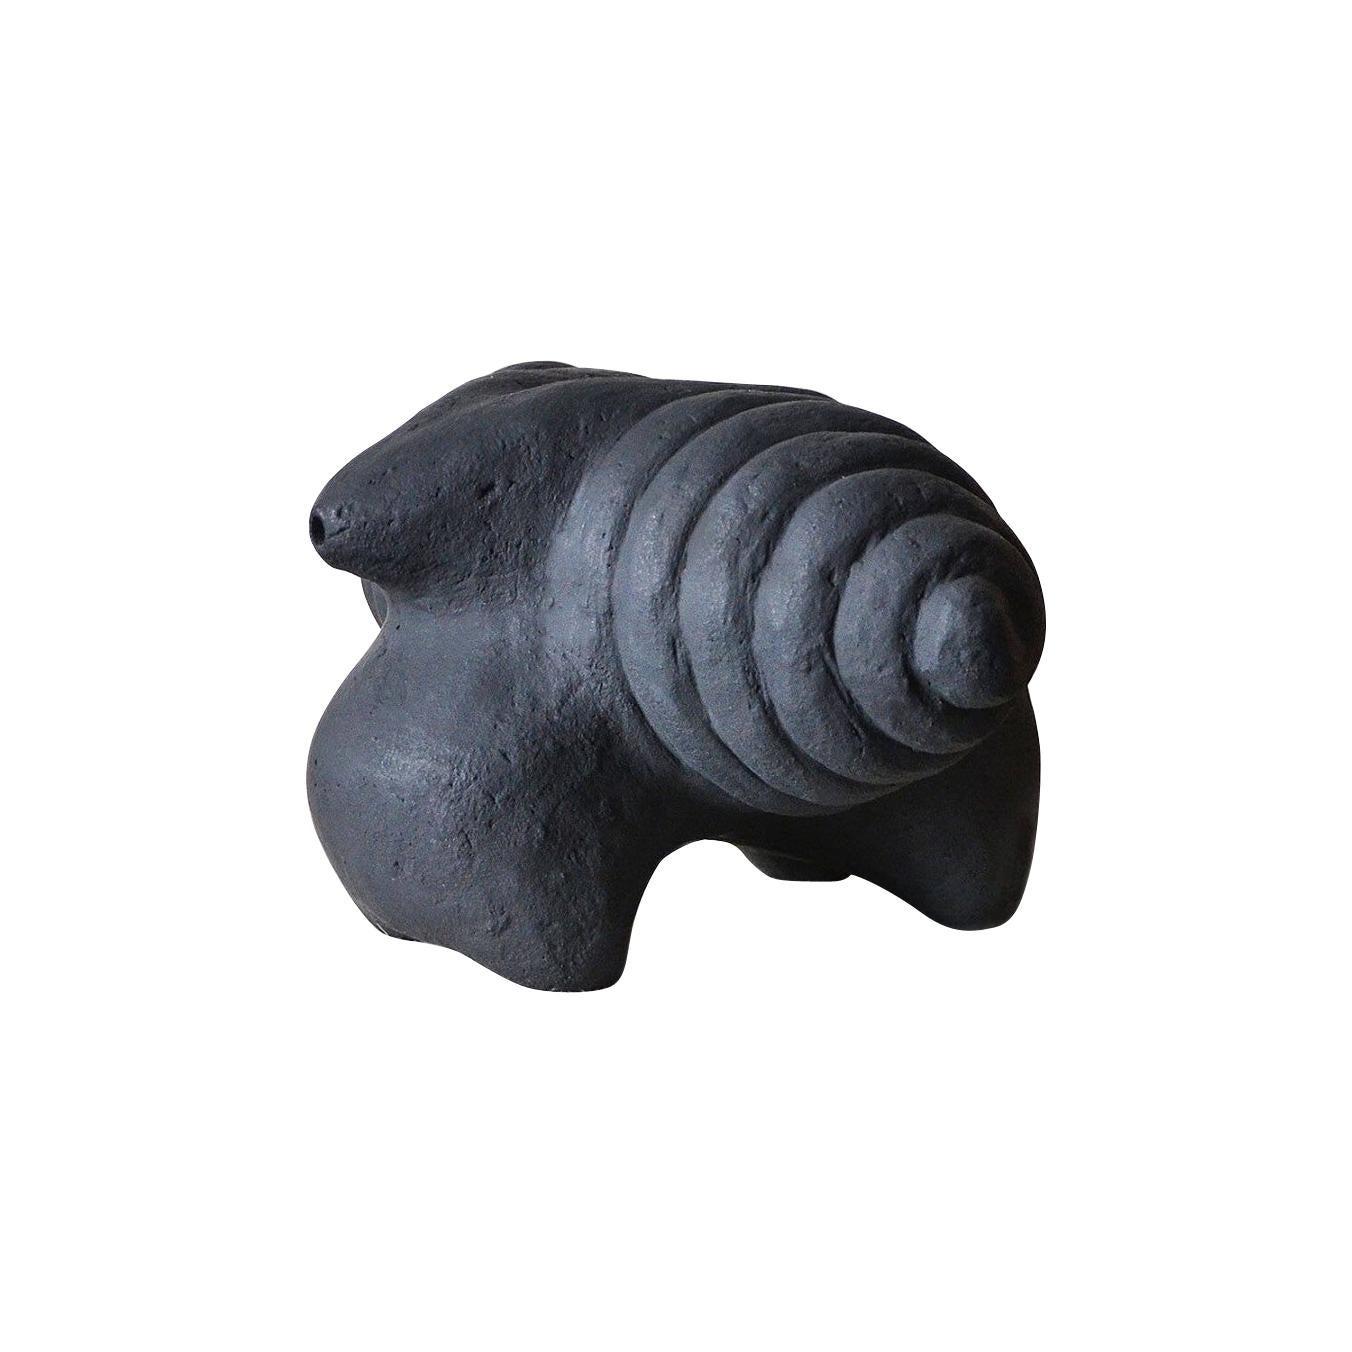 Sculpted Ceramic Vase by FAINA